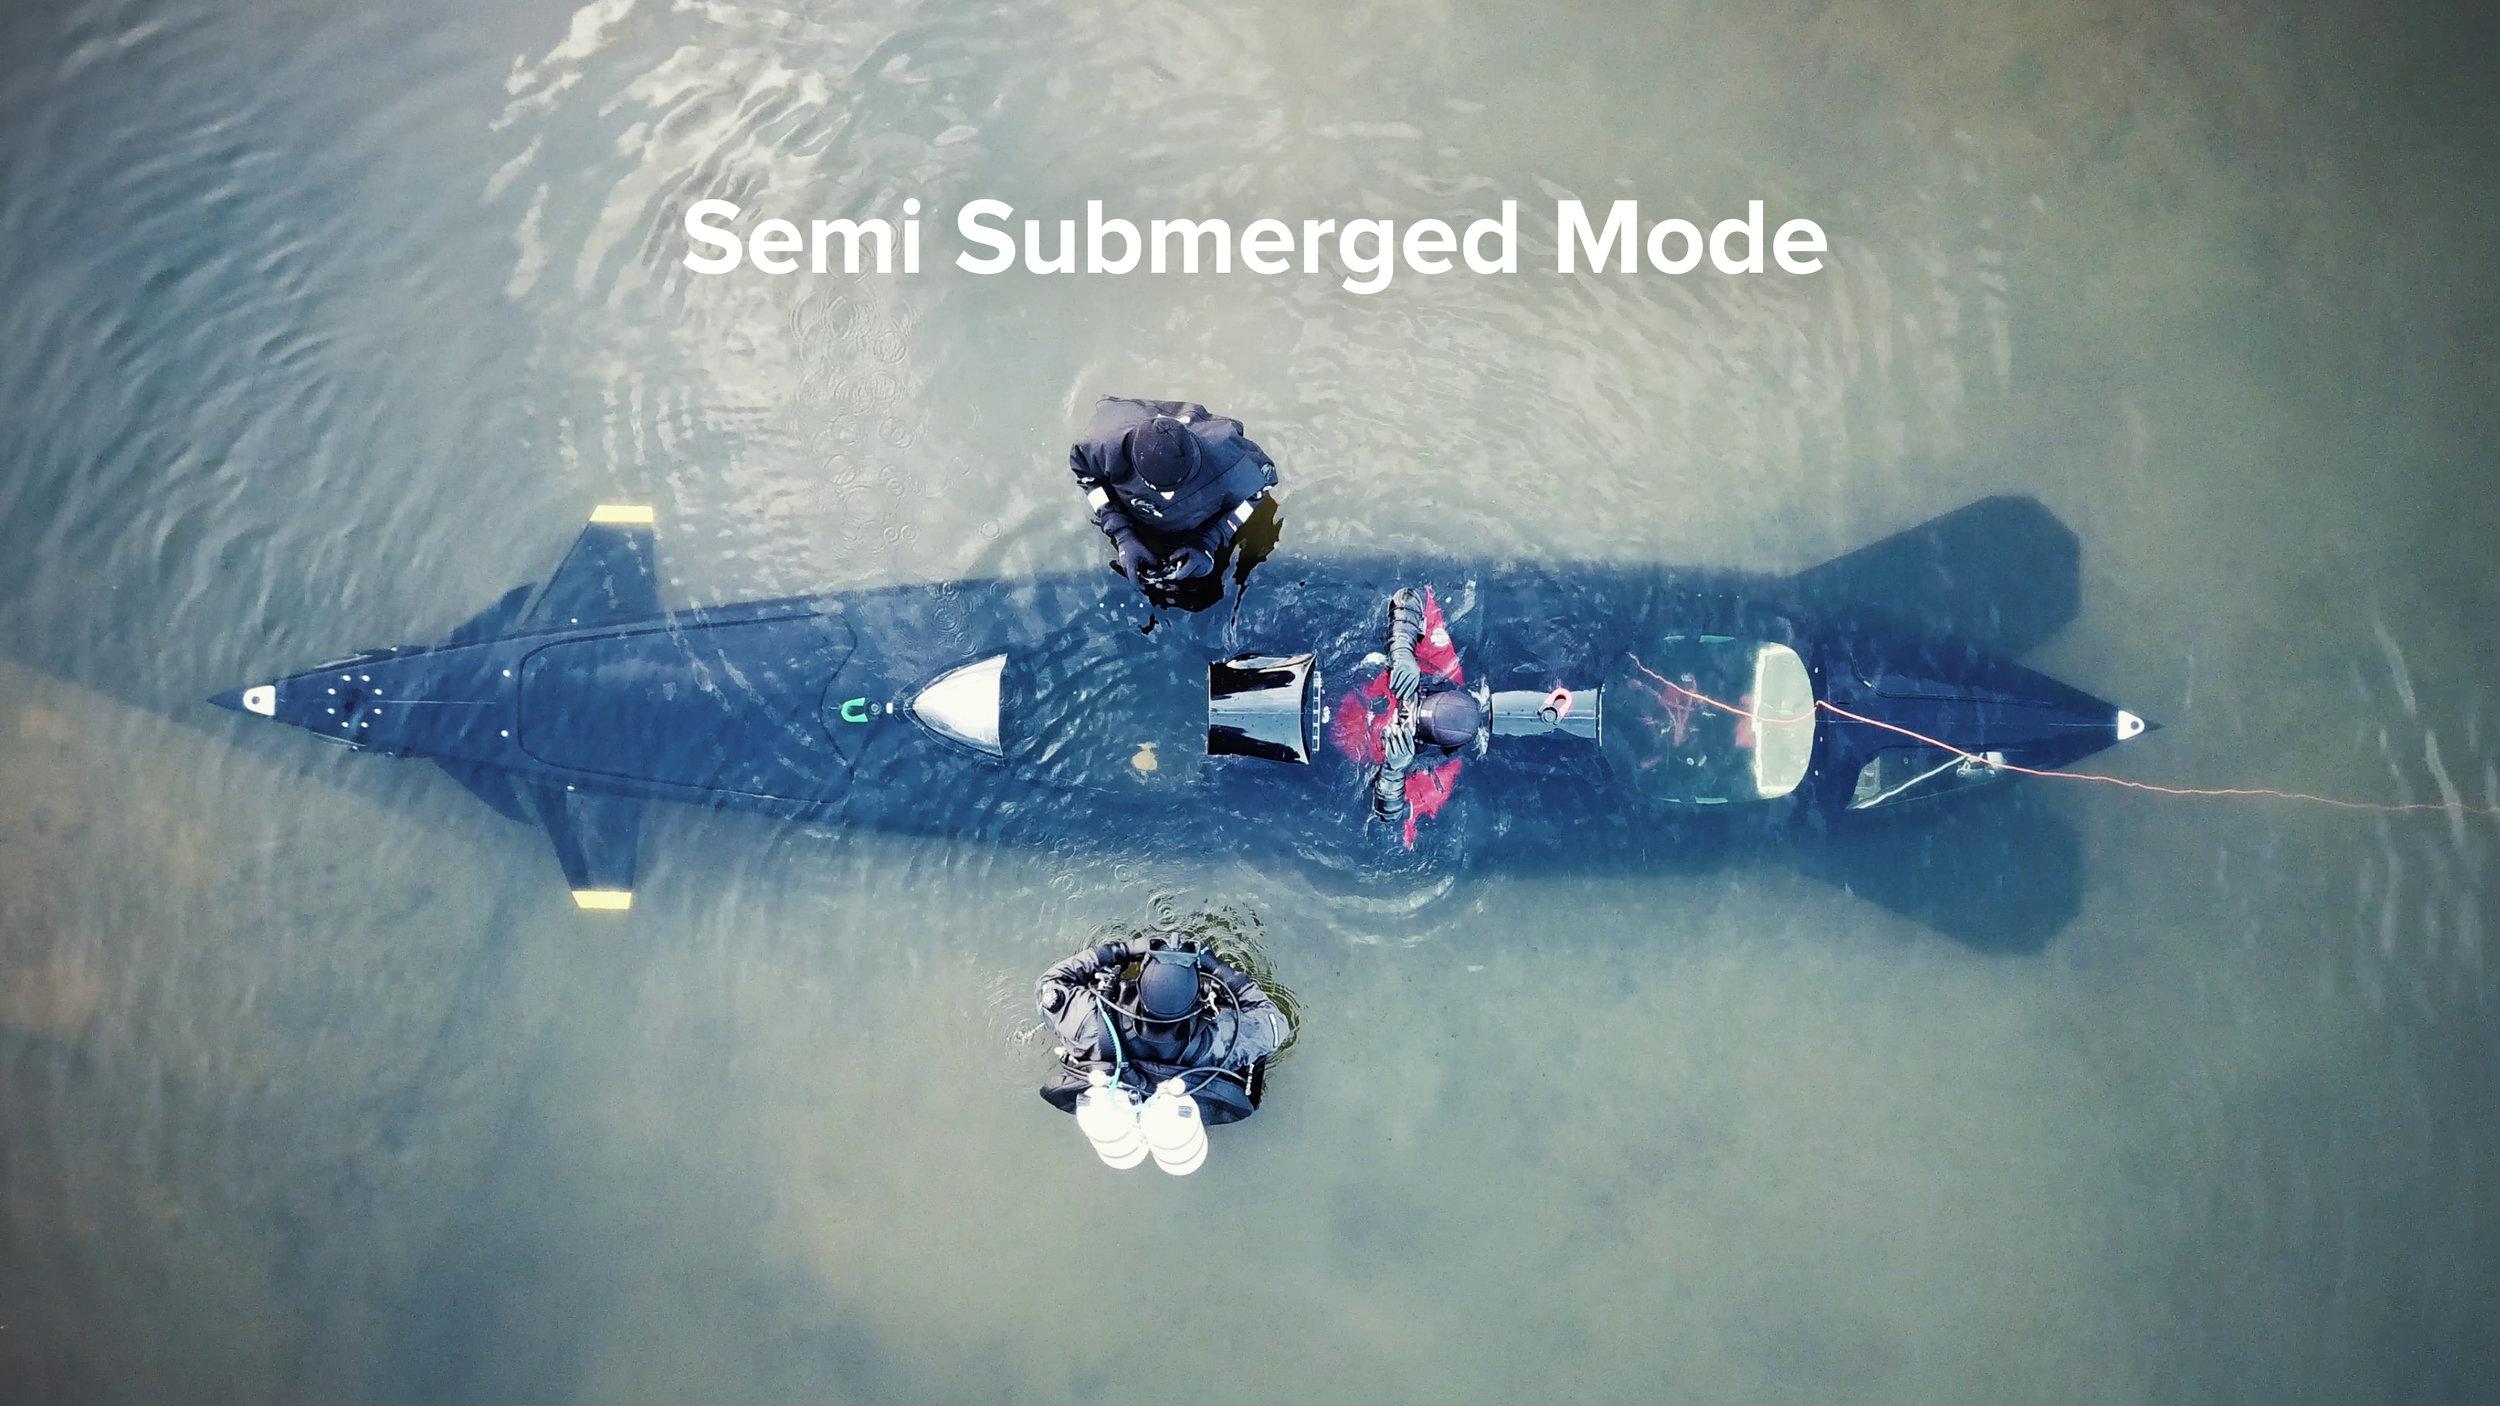 mk1c_options_semi_submerged_mode.jpg